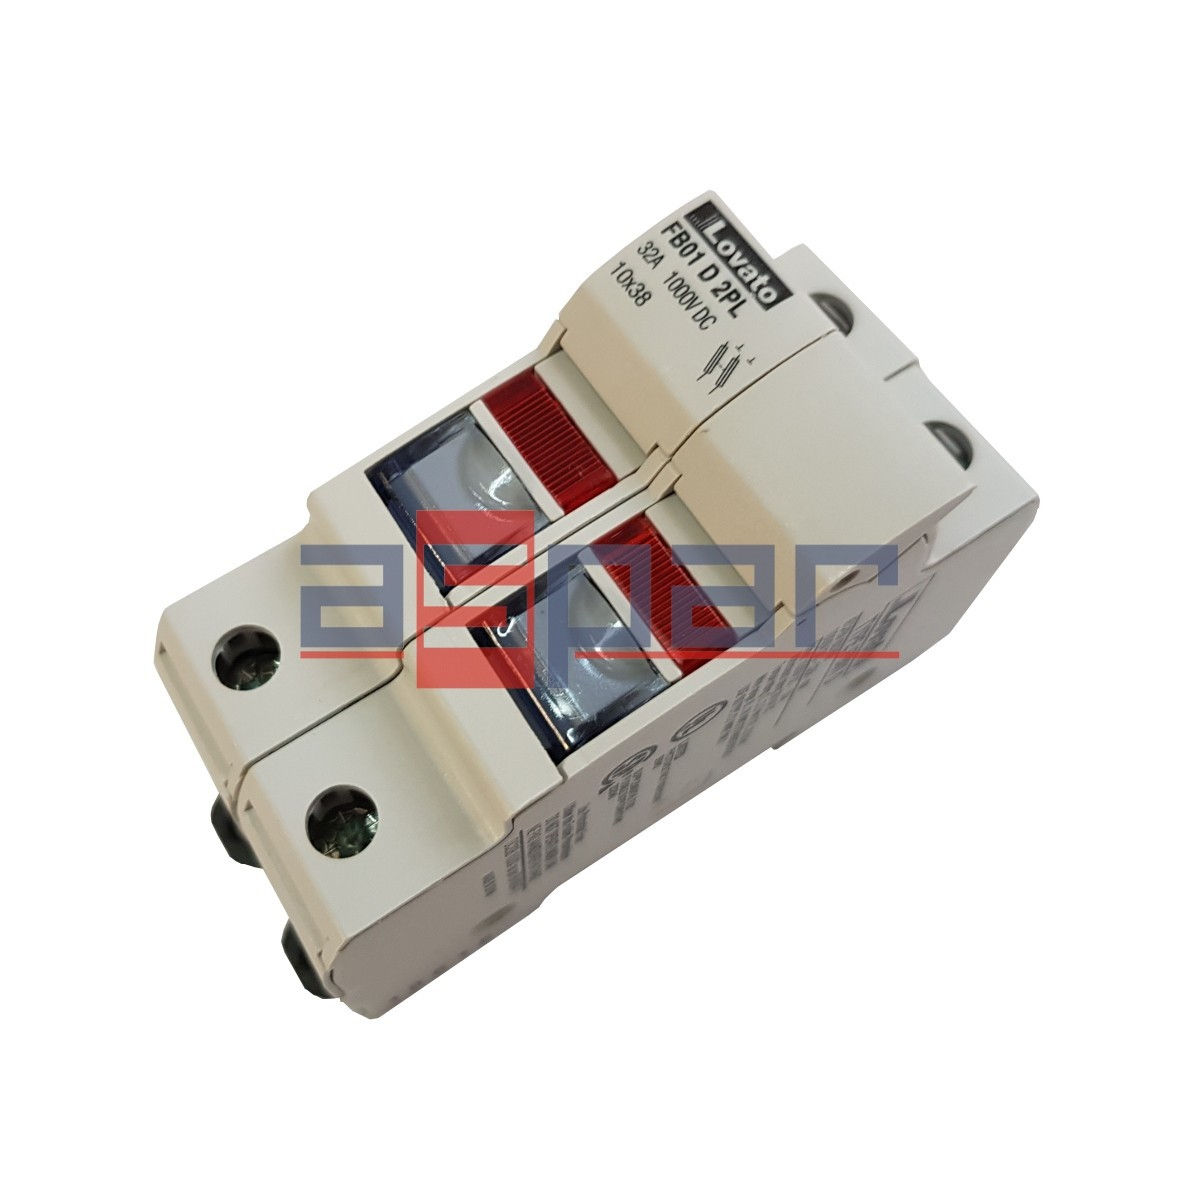 FB01D2PL - Podstawa bezpiecznika ze wskaźnikiem 10x38, 2 pola